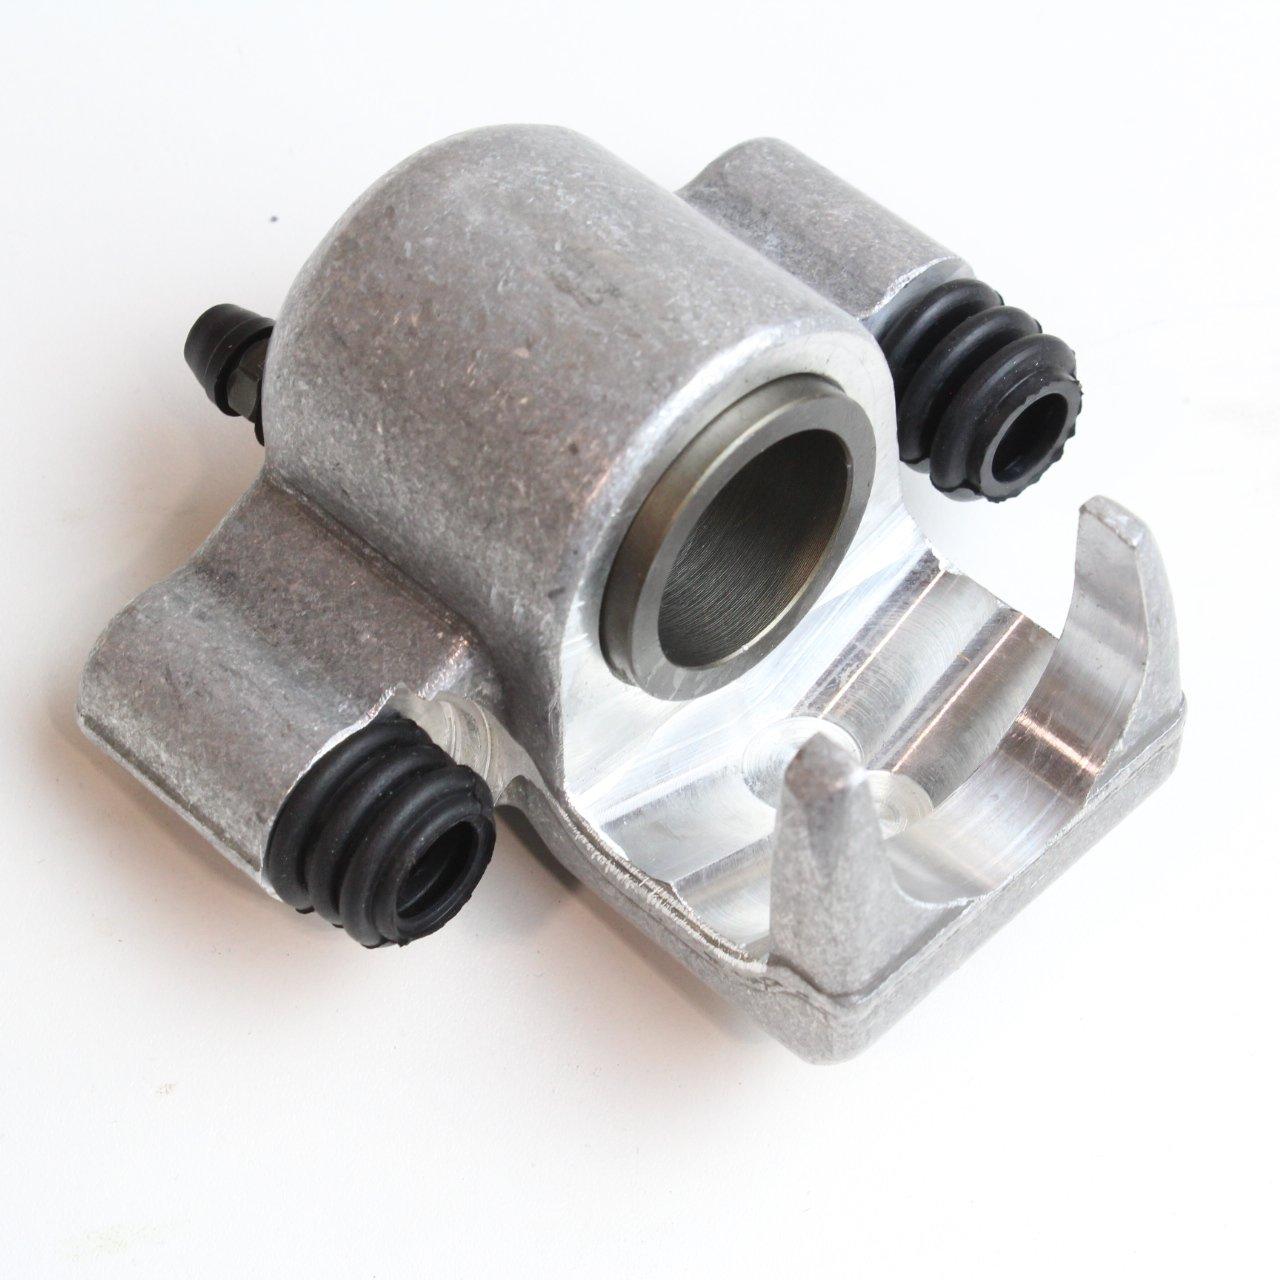 Left Brake Caliper Assembly 2005-2006 Polaris ATP Outlaw 330 500 1911048 1910875